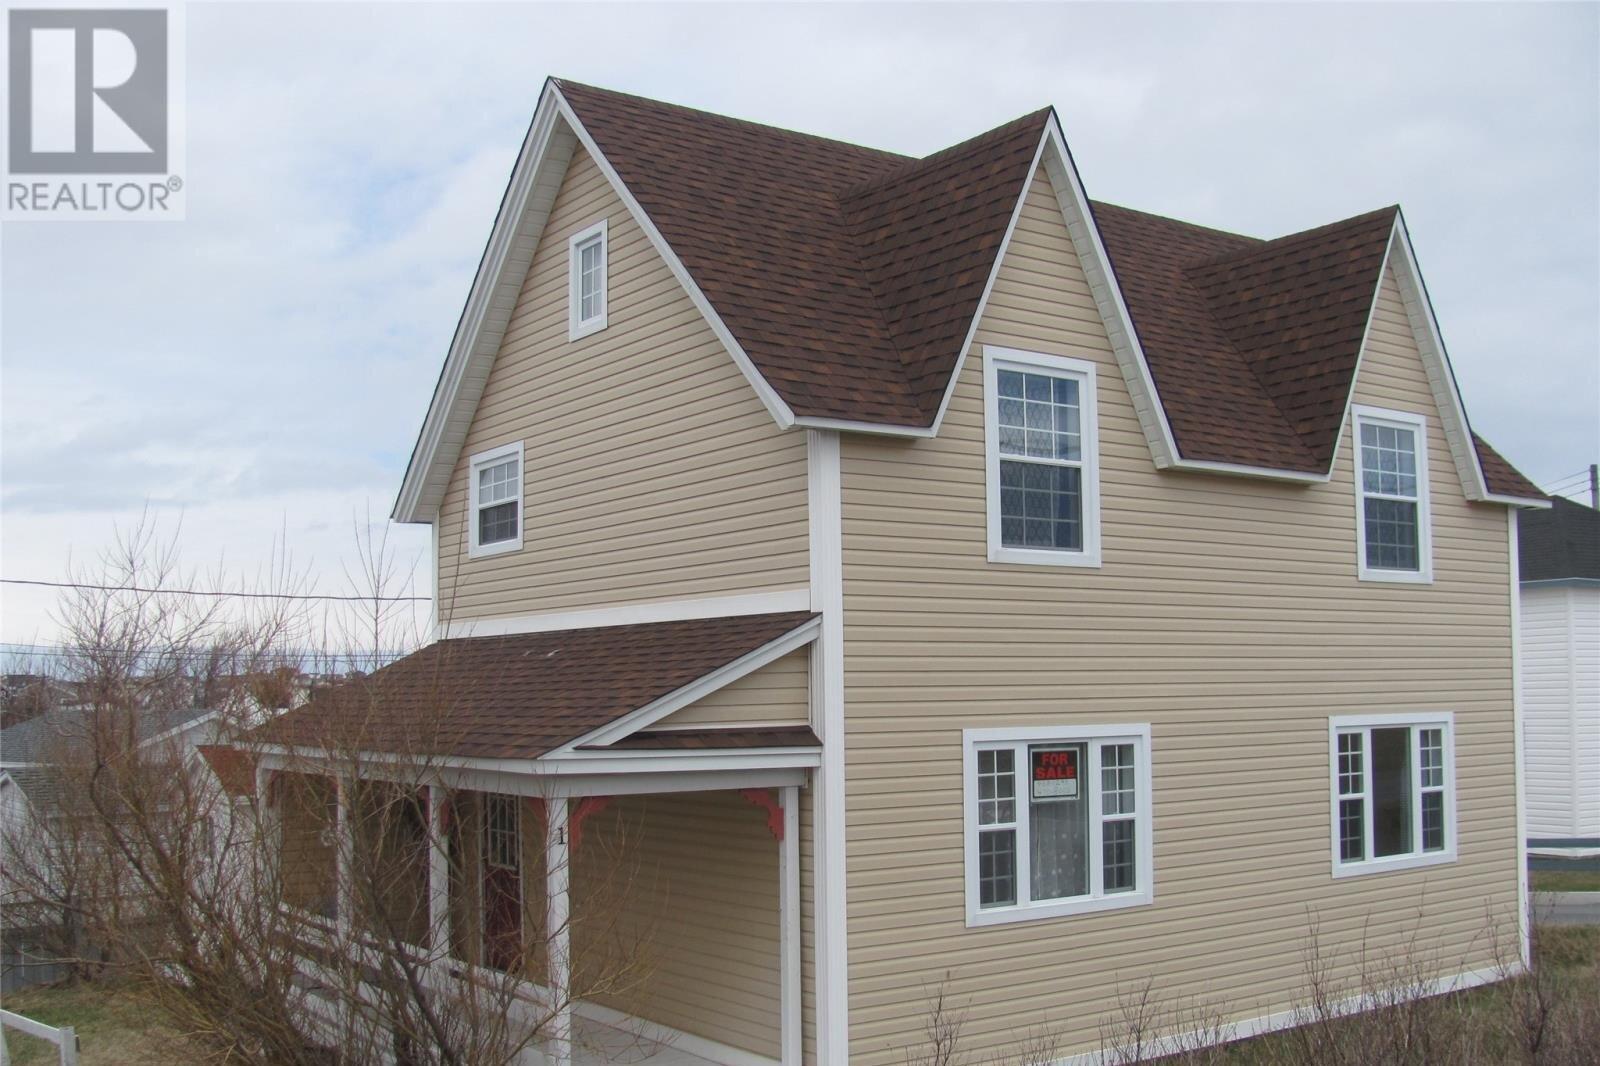 House for sale at 1 Lench Ln Bonavista Newfoundland - MLS: 1216879